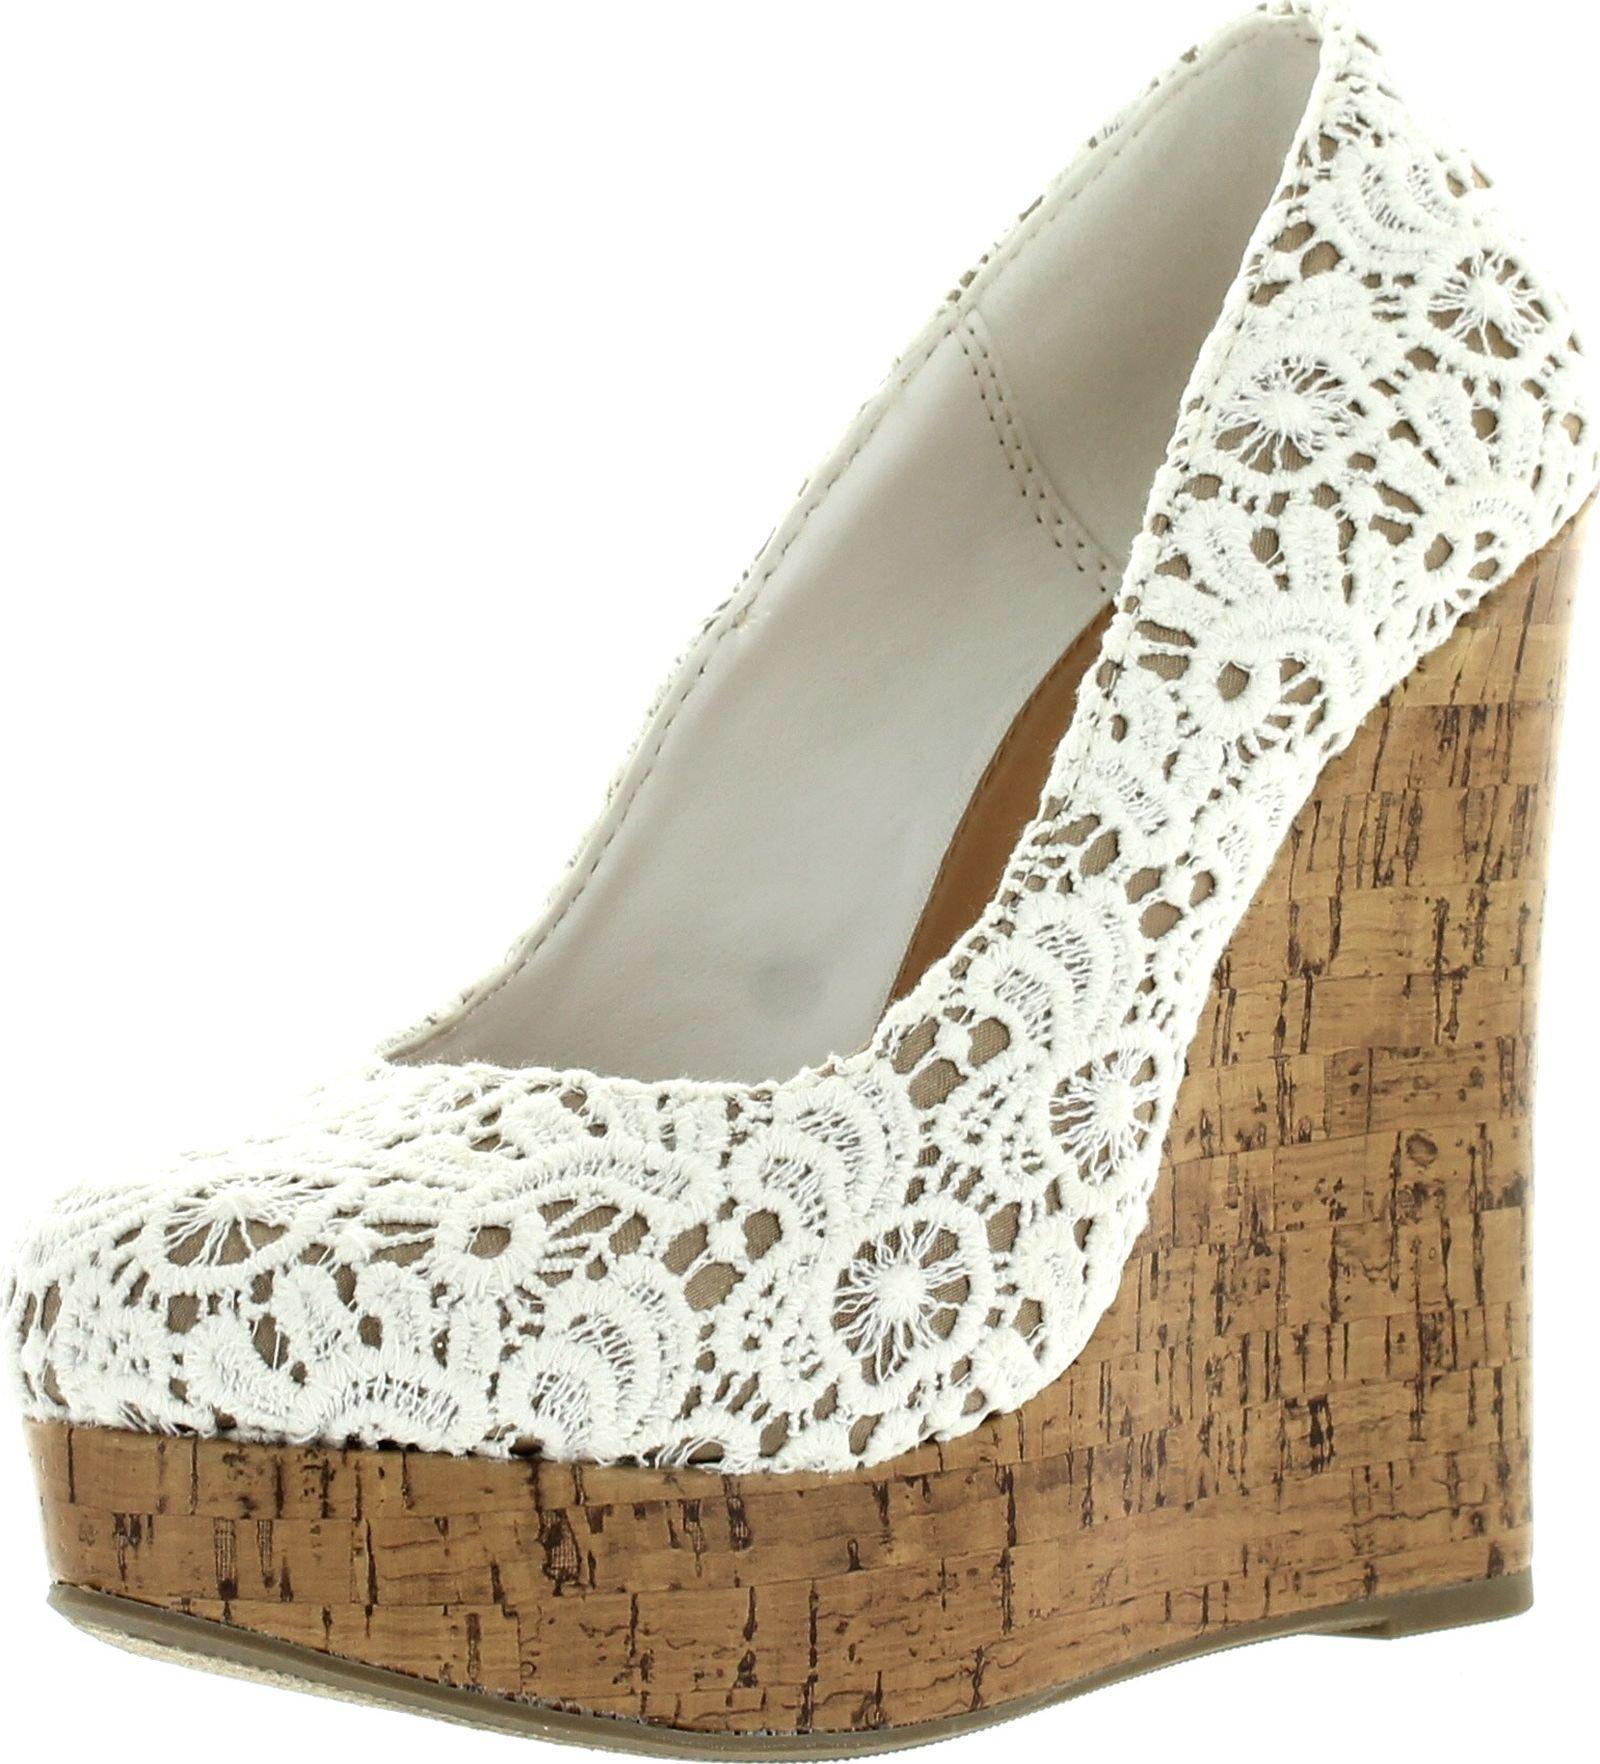 Sully's Dress Almond Toe Crochet Platform High Wedge Heel Summer Sandals,Off White,7